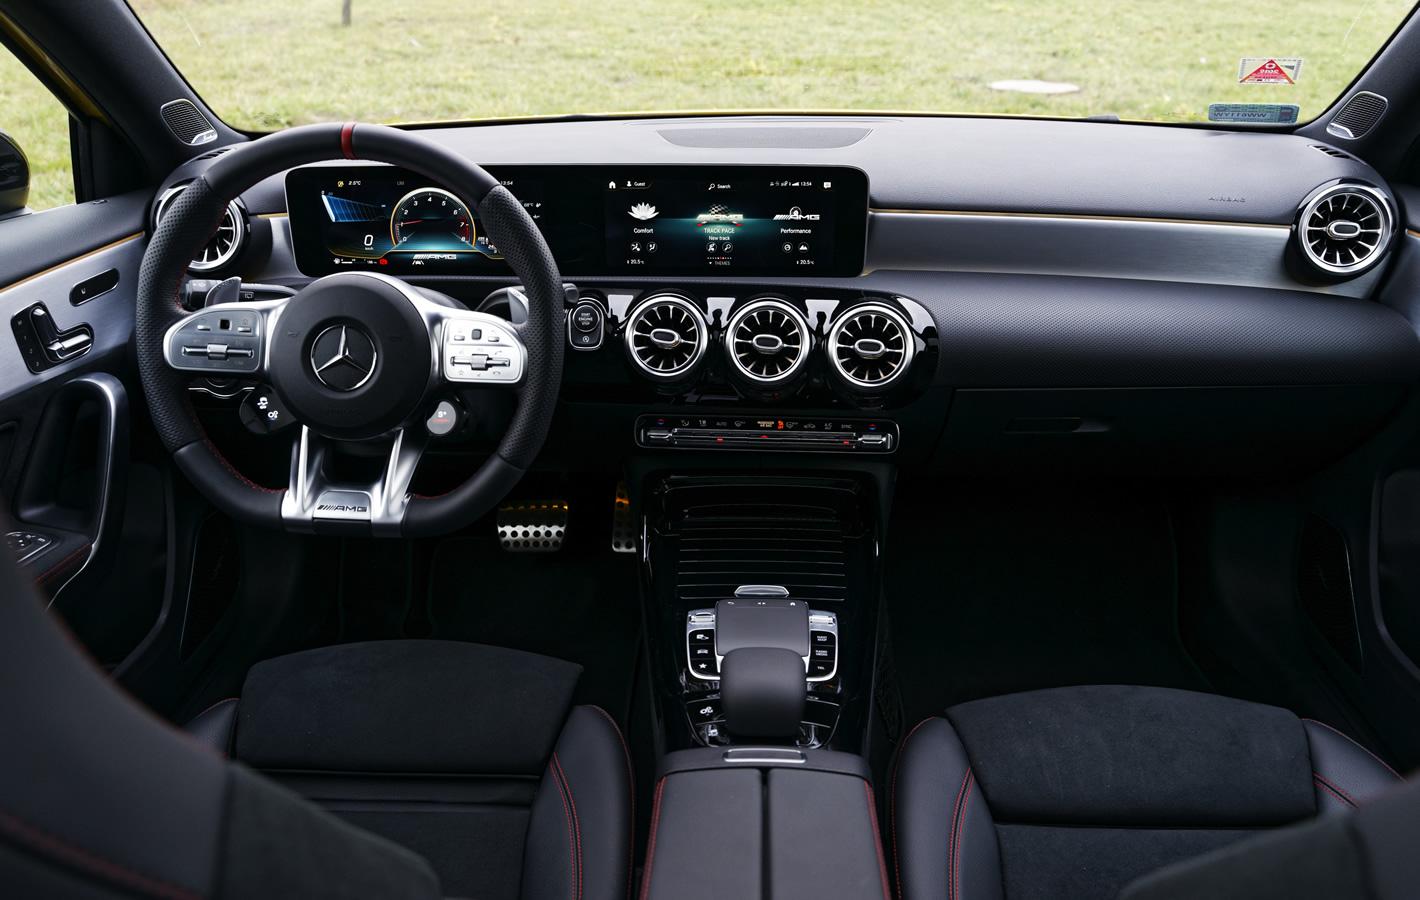 Mercedes-AMG A35 4Matic